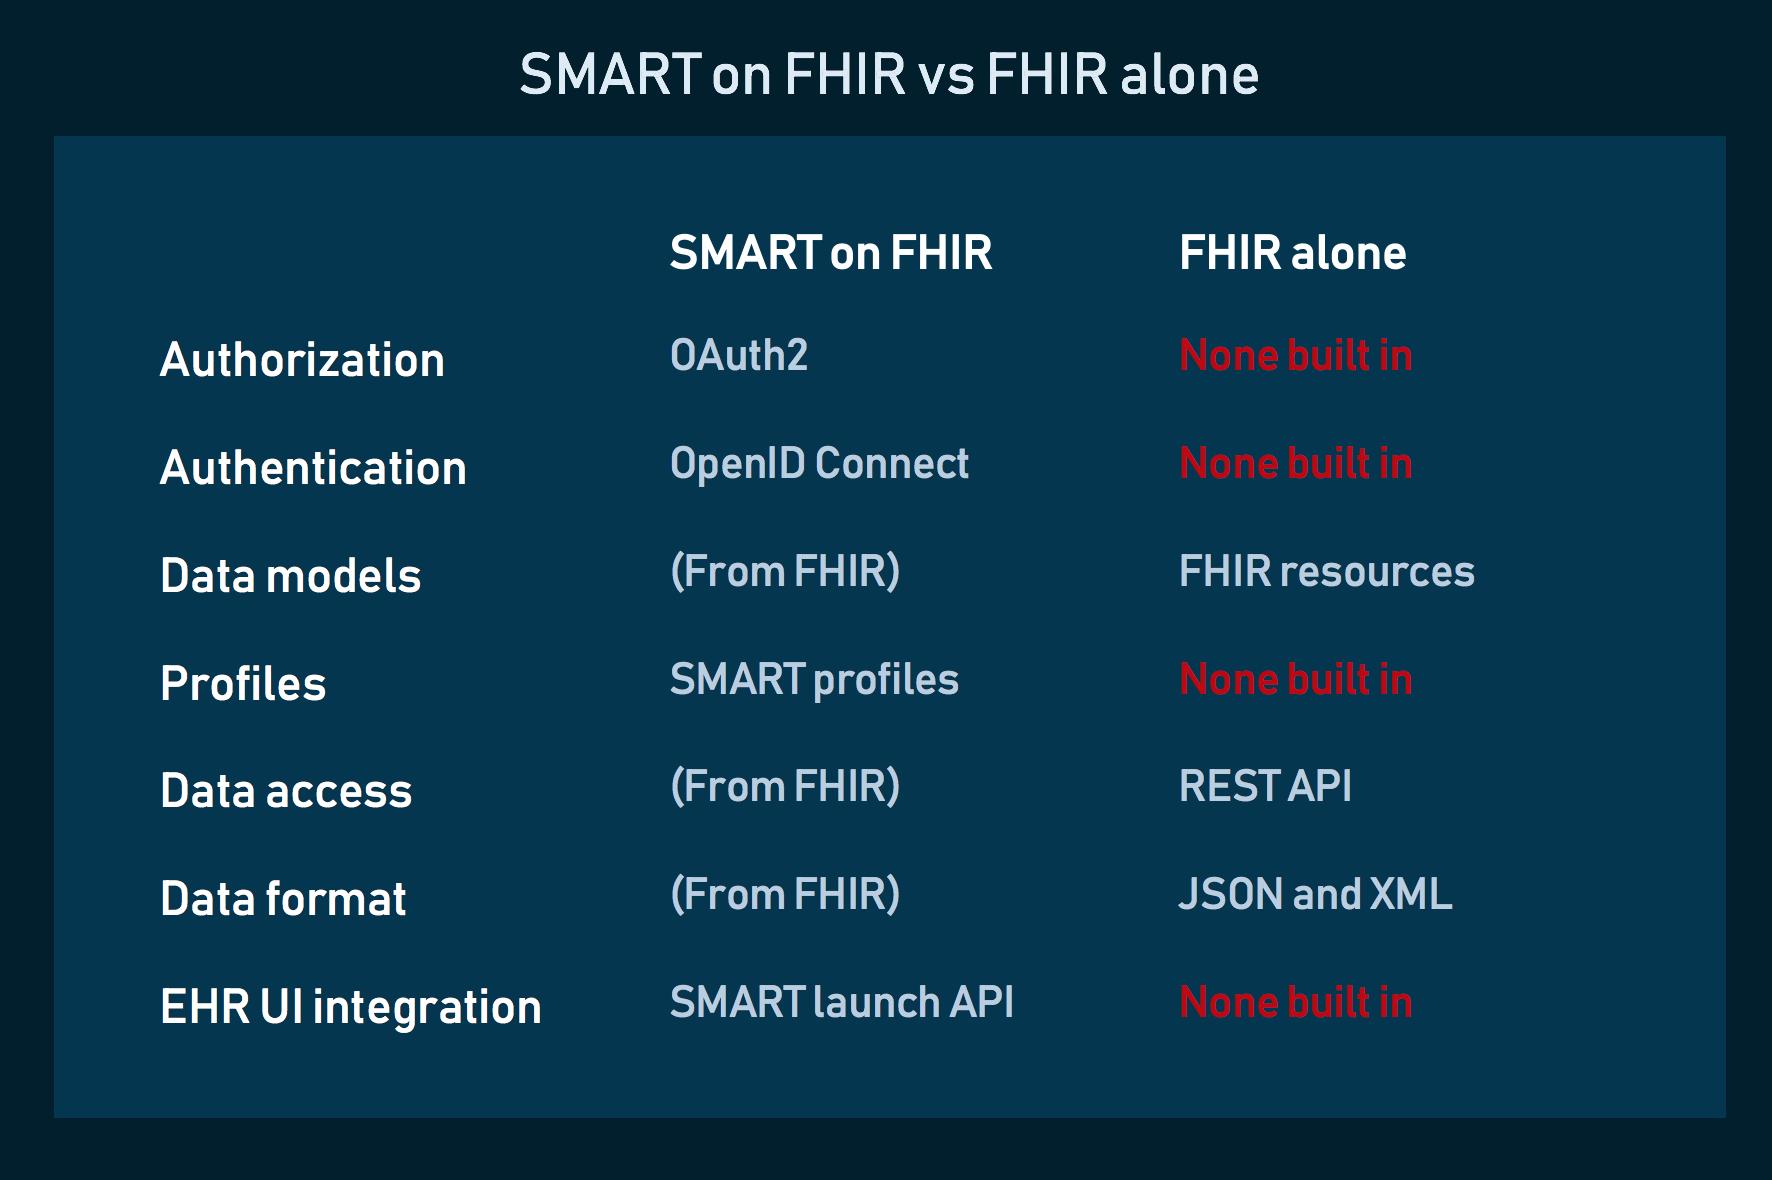 Comparing SMART on FHIR and original FHIR